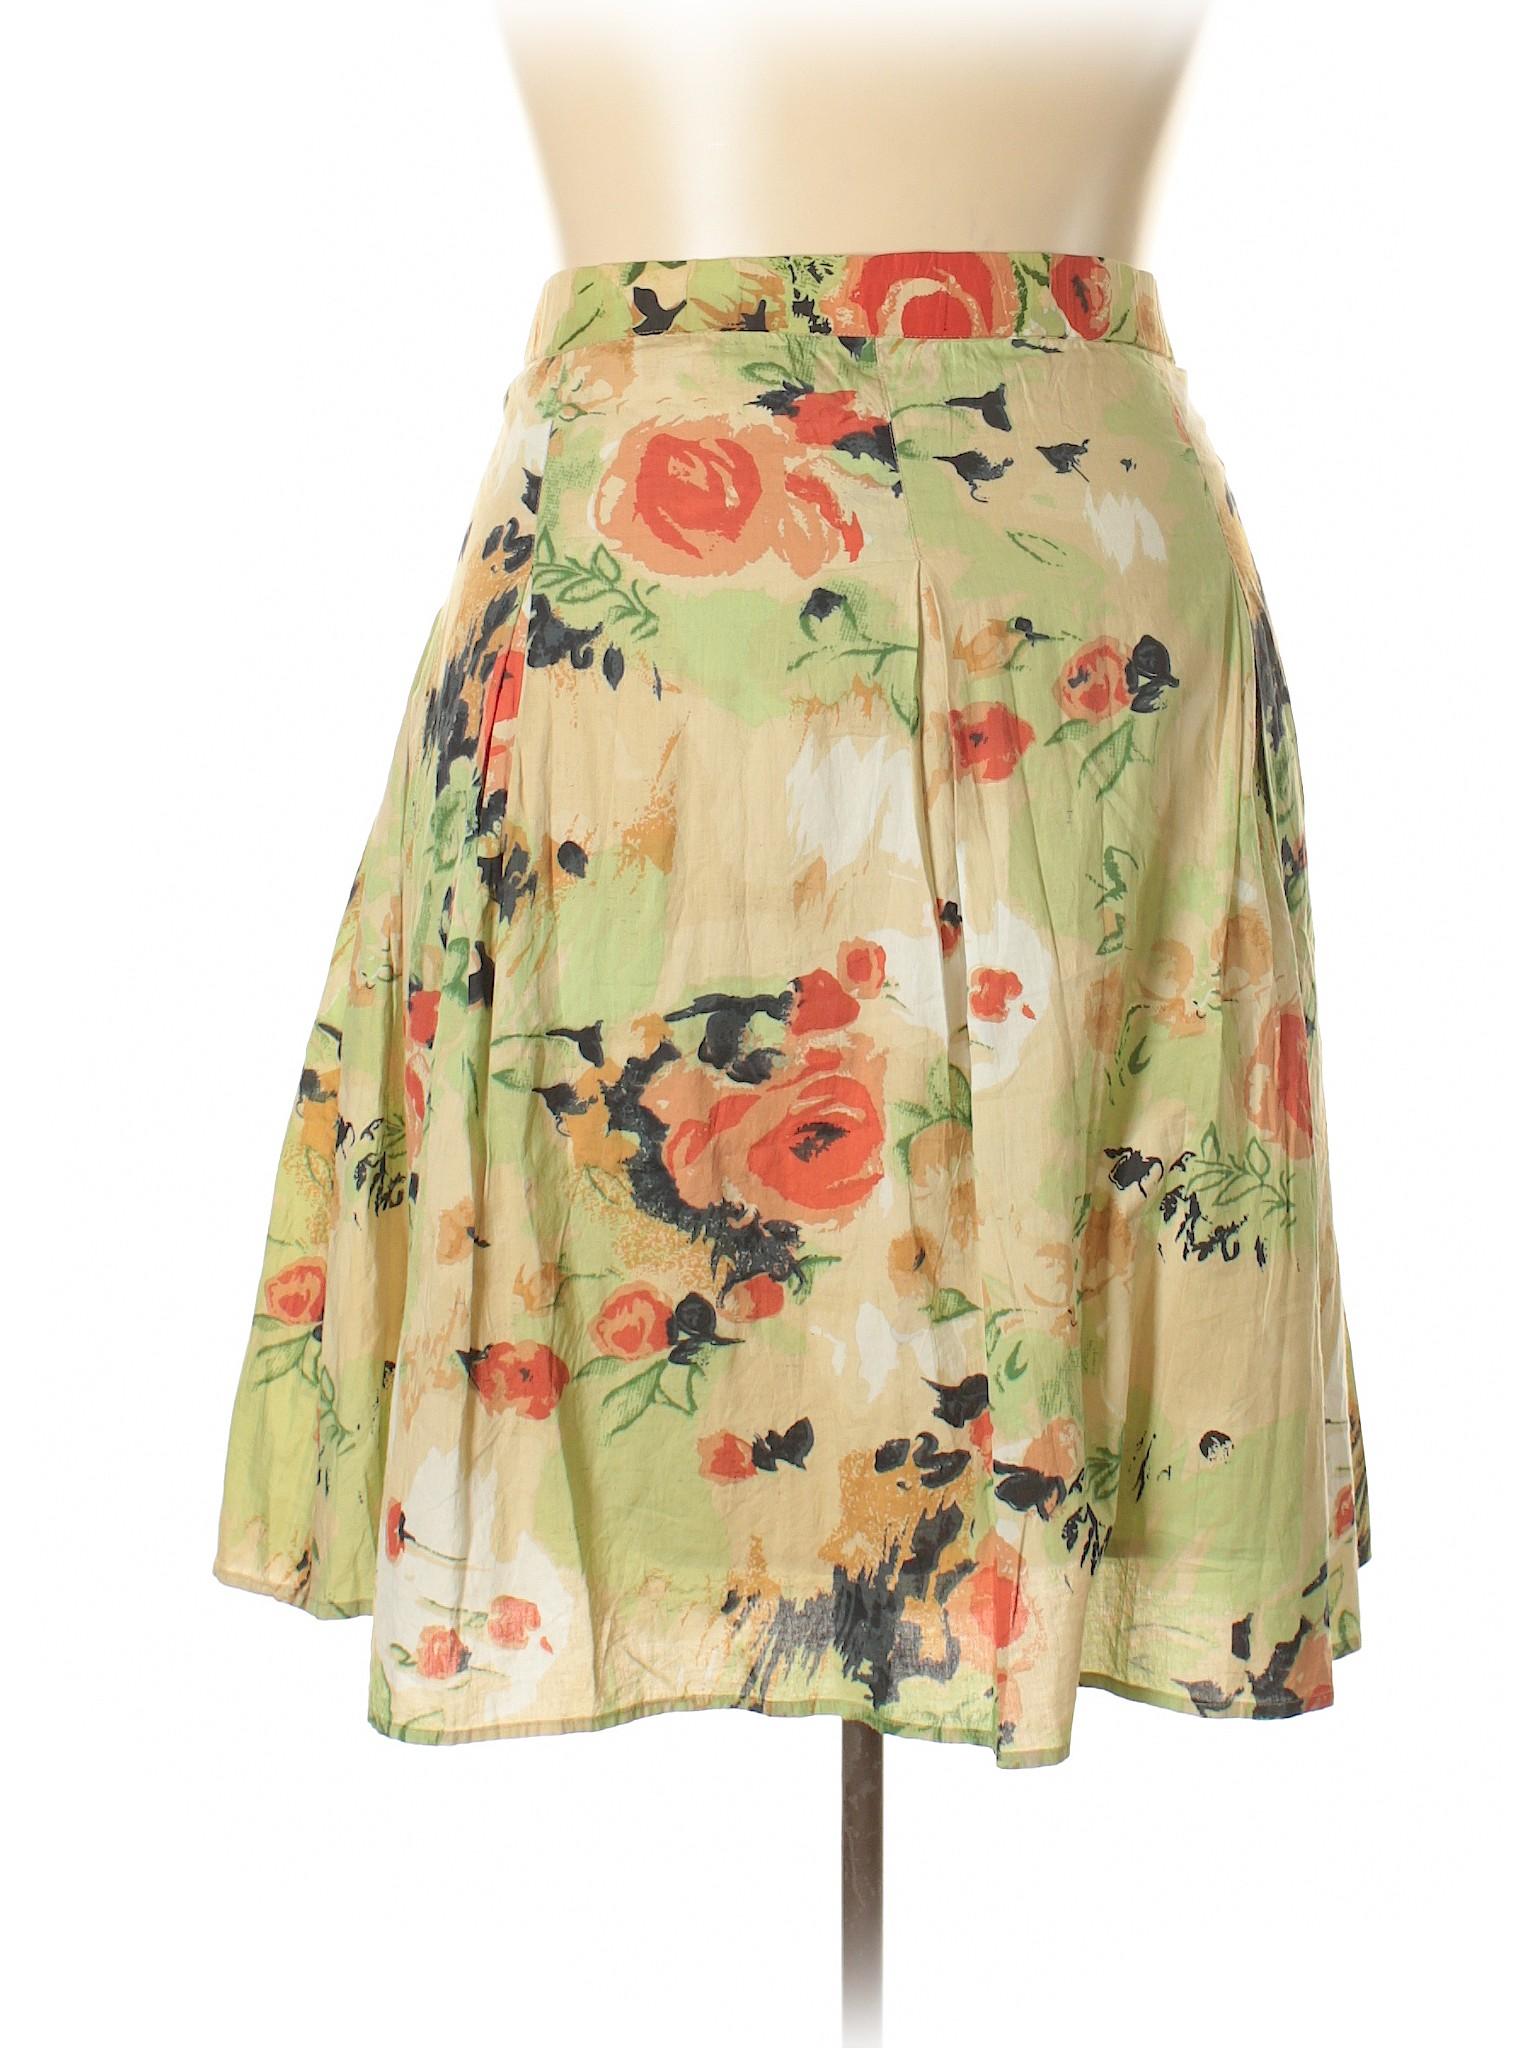 leisure Casual Outlet Skirt Venezia Boutique w6qa8nd